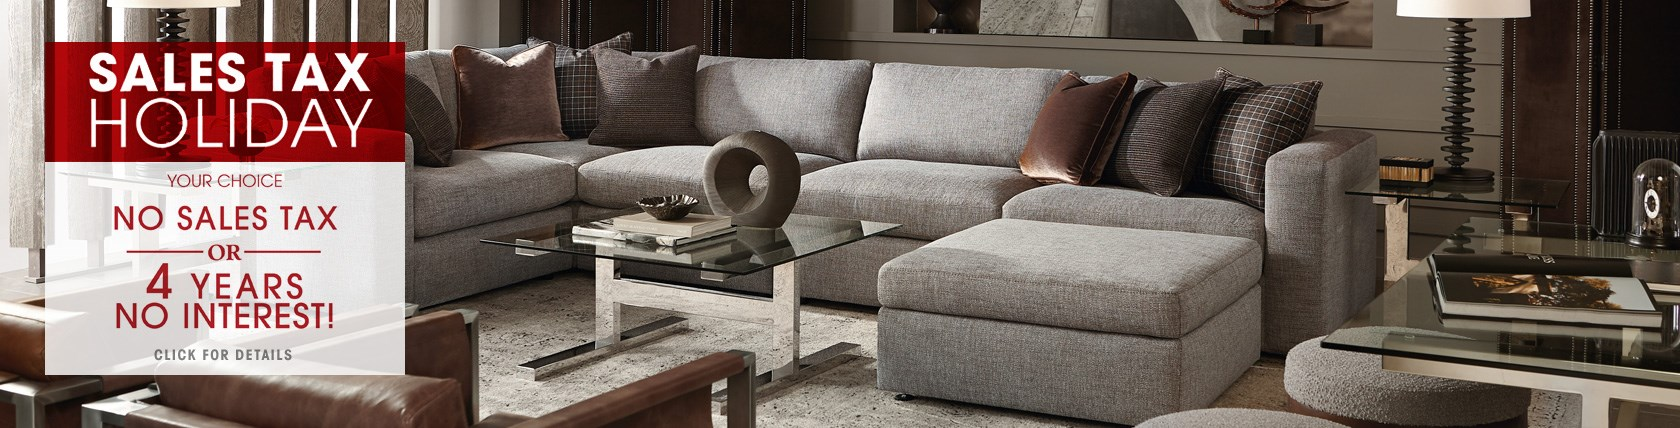 Warehouse Furniture Clearance Sale